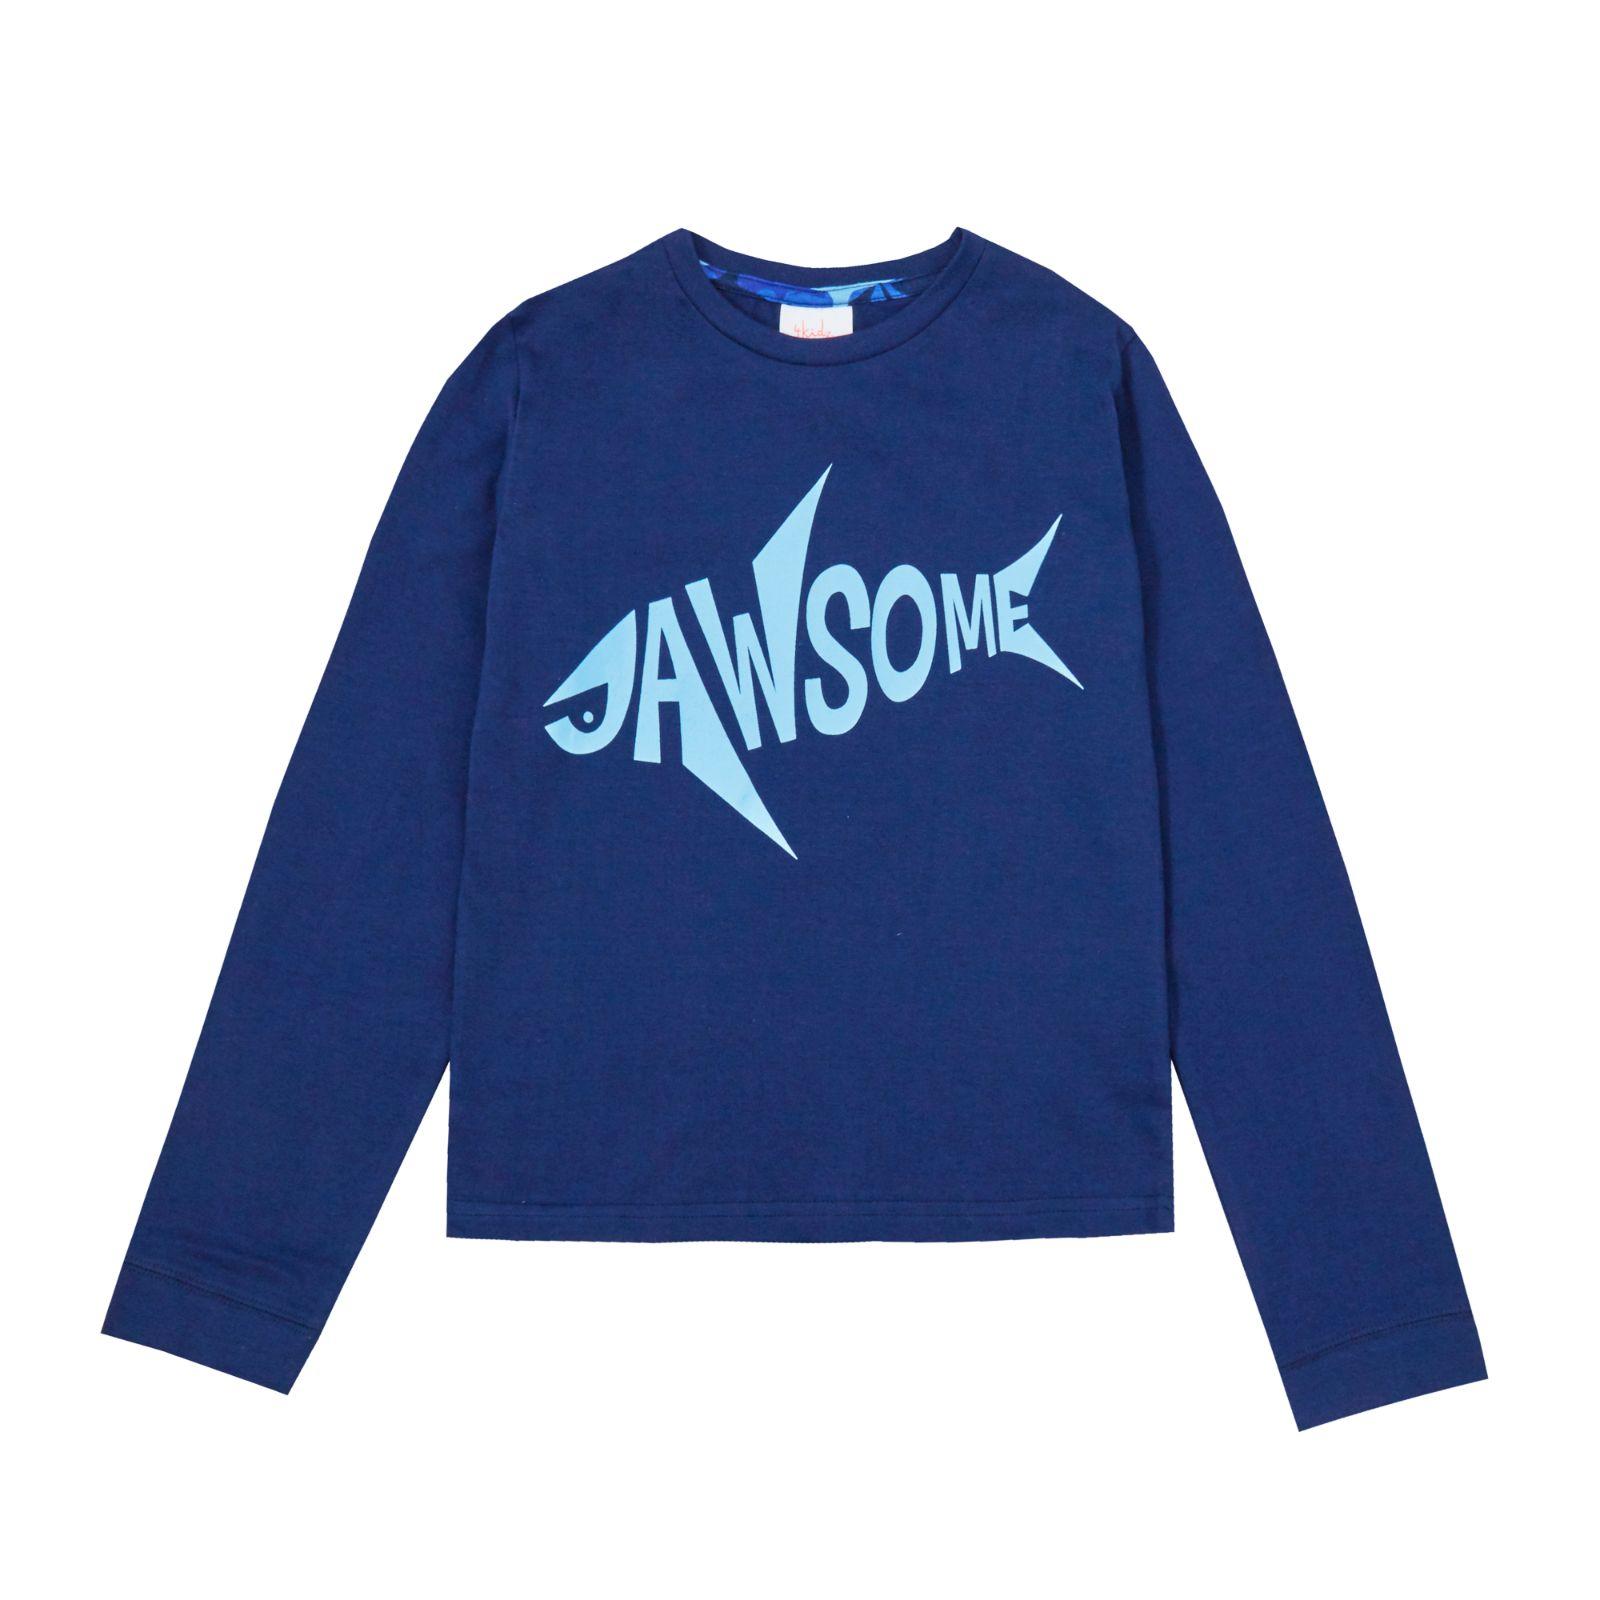 Boys Shark Pyjamas Kids Younger Older Boys Cuffed Pjs Luxury Loungewear Gift Set